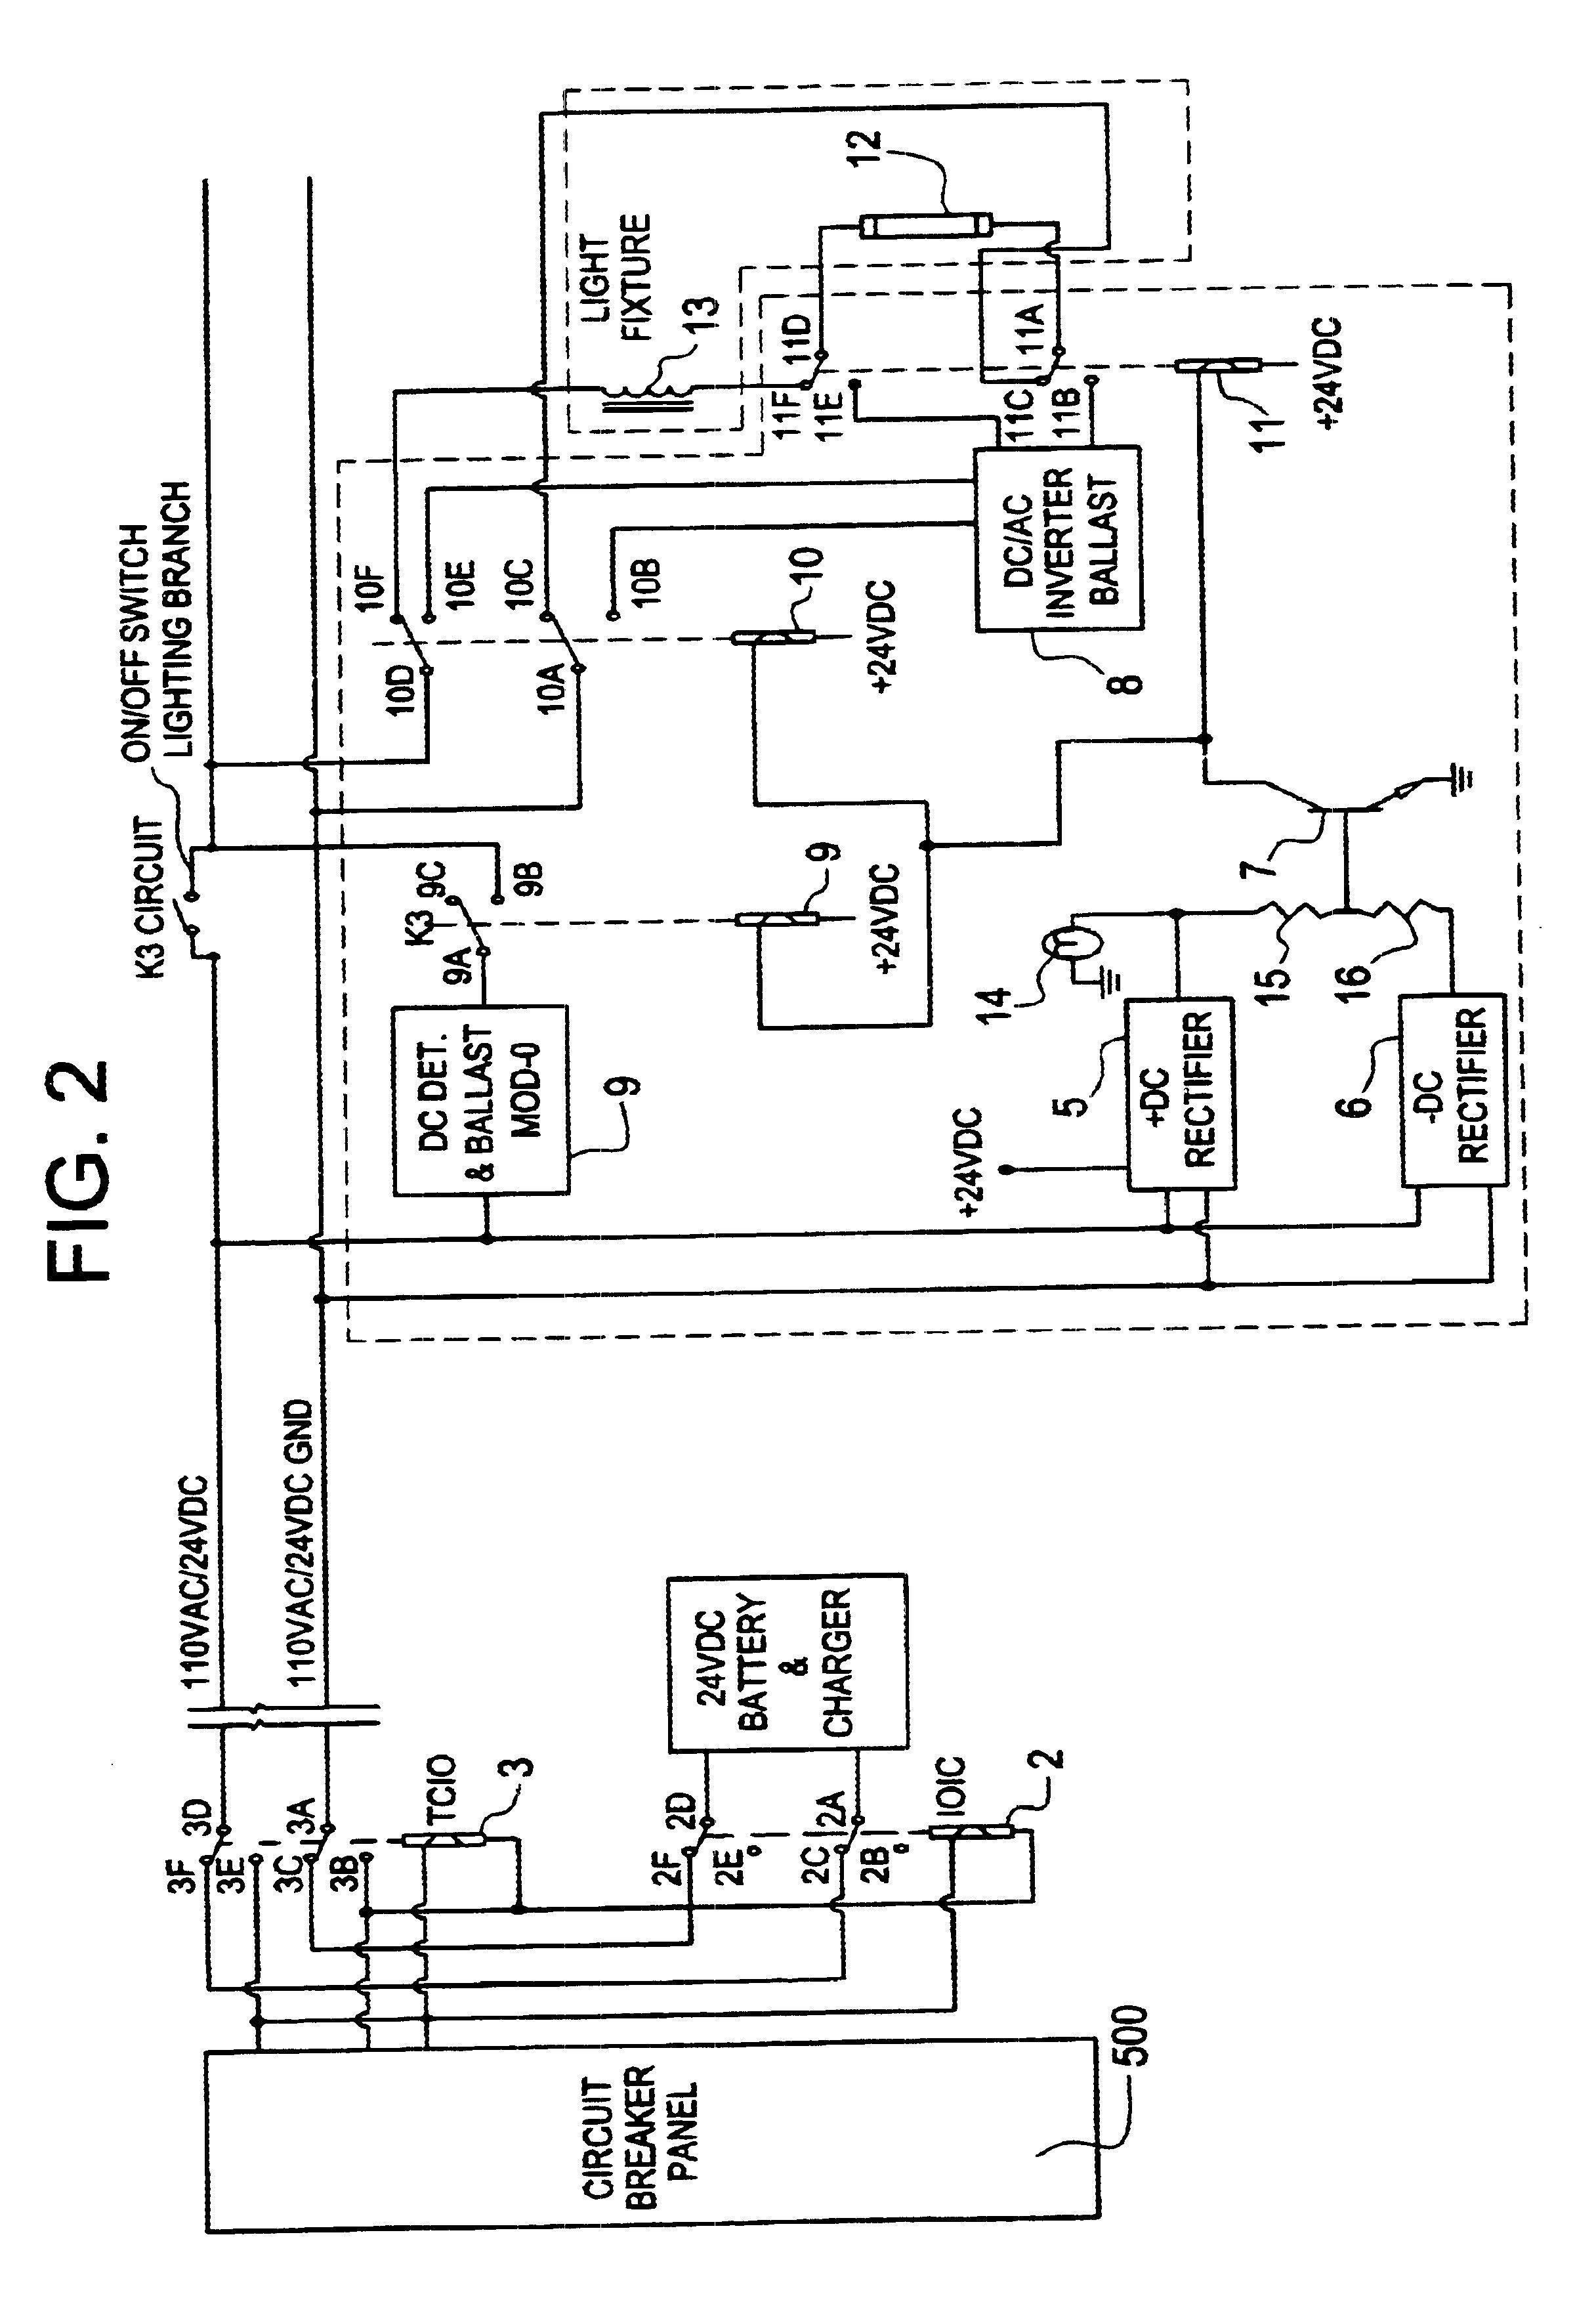 Home Telephone Wiring Diagram Simple